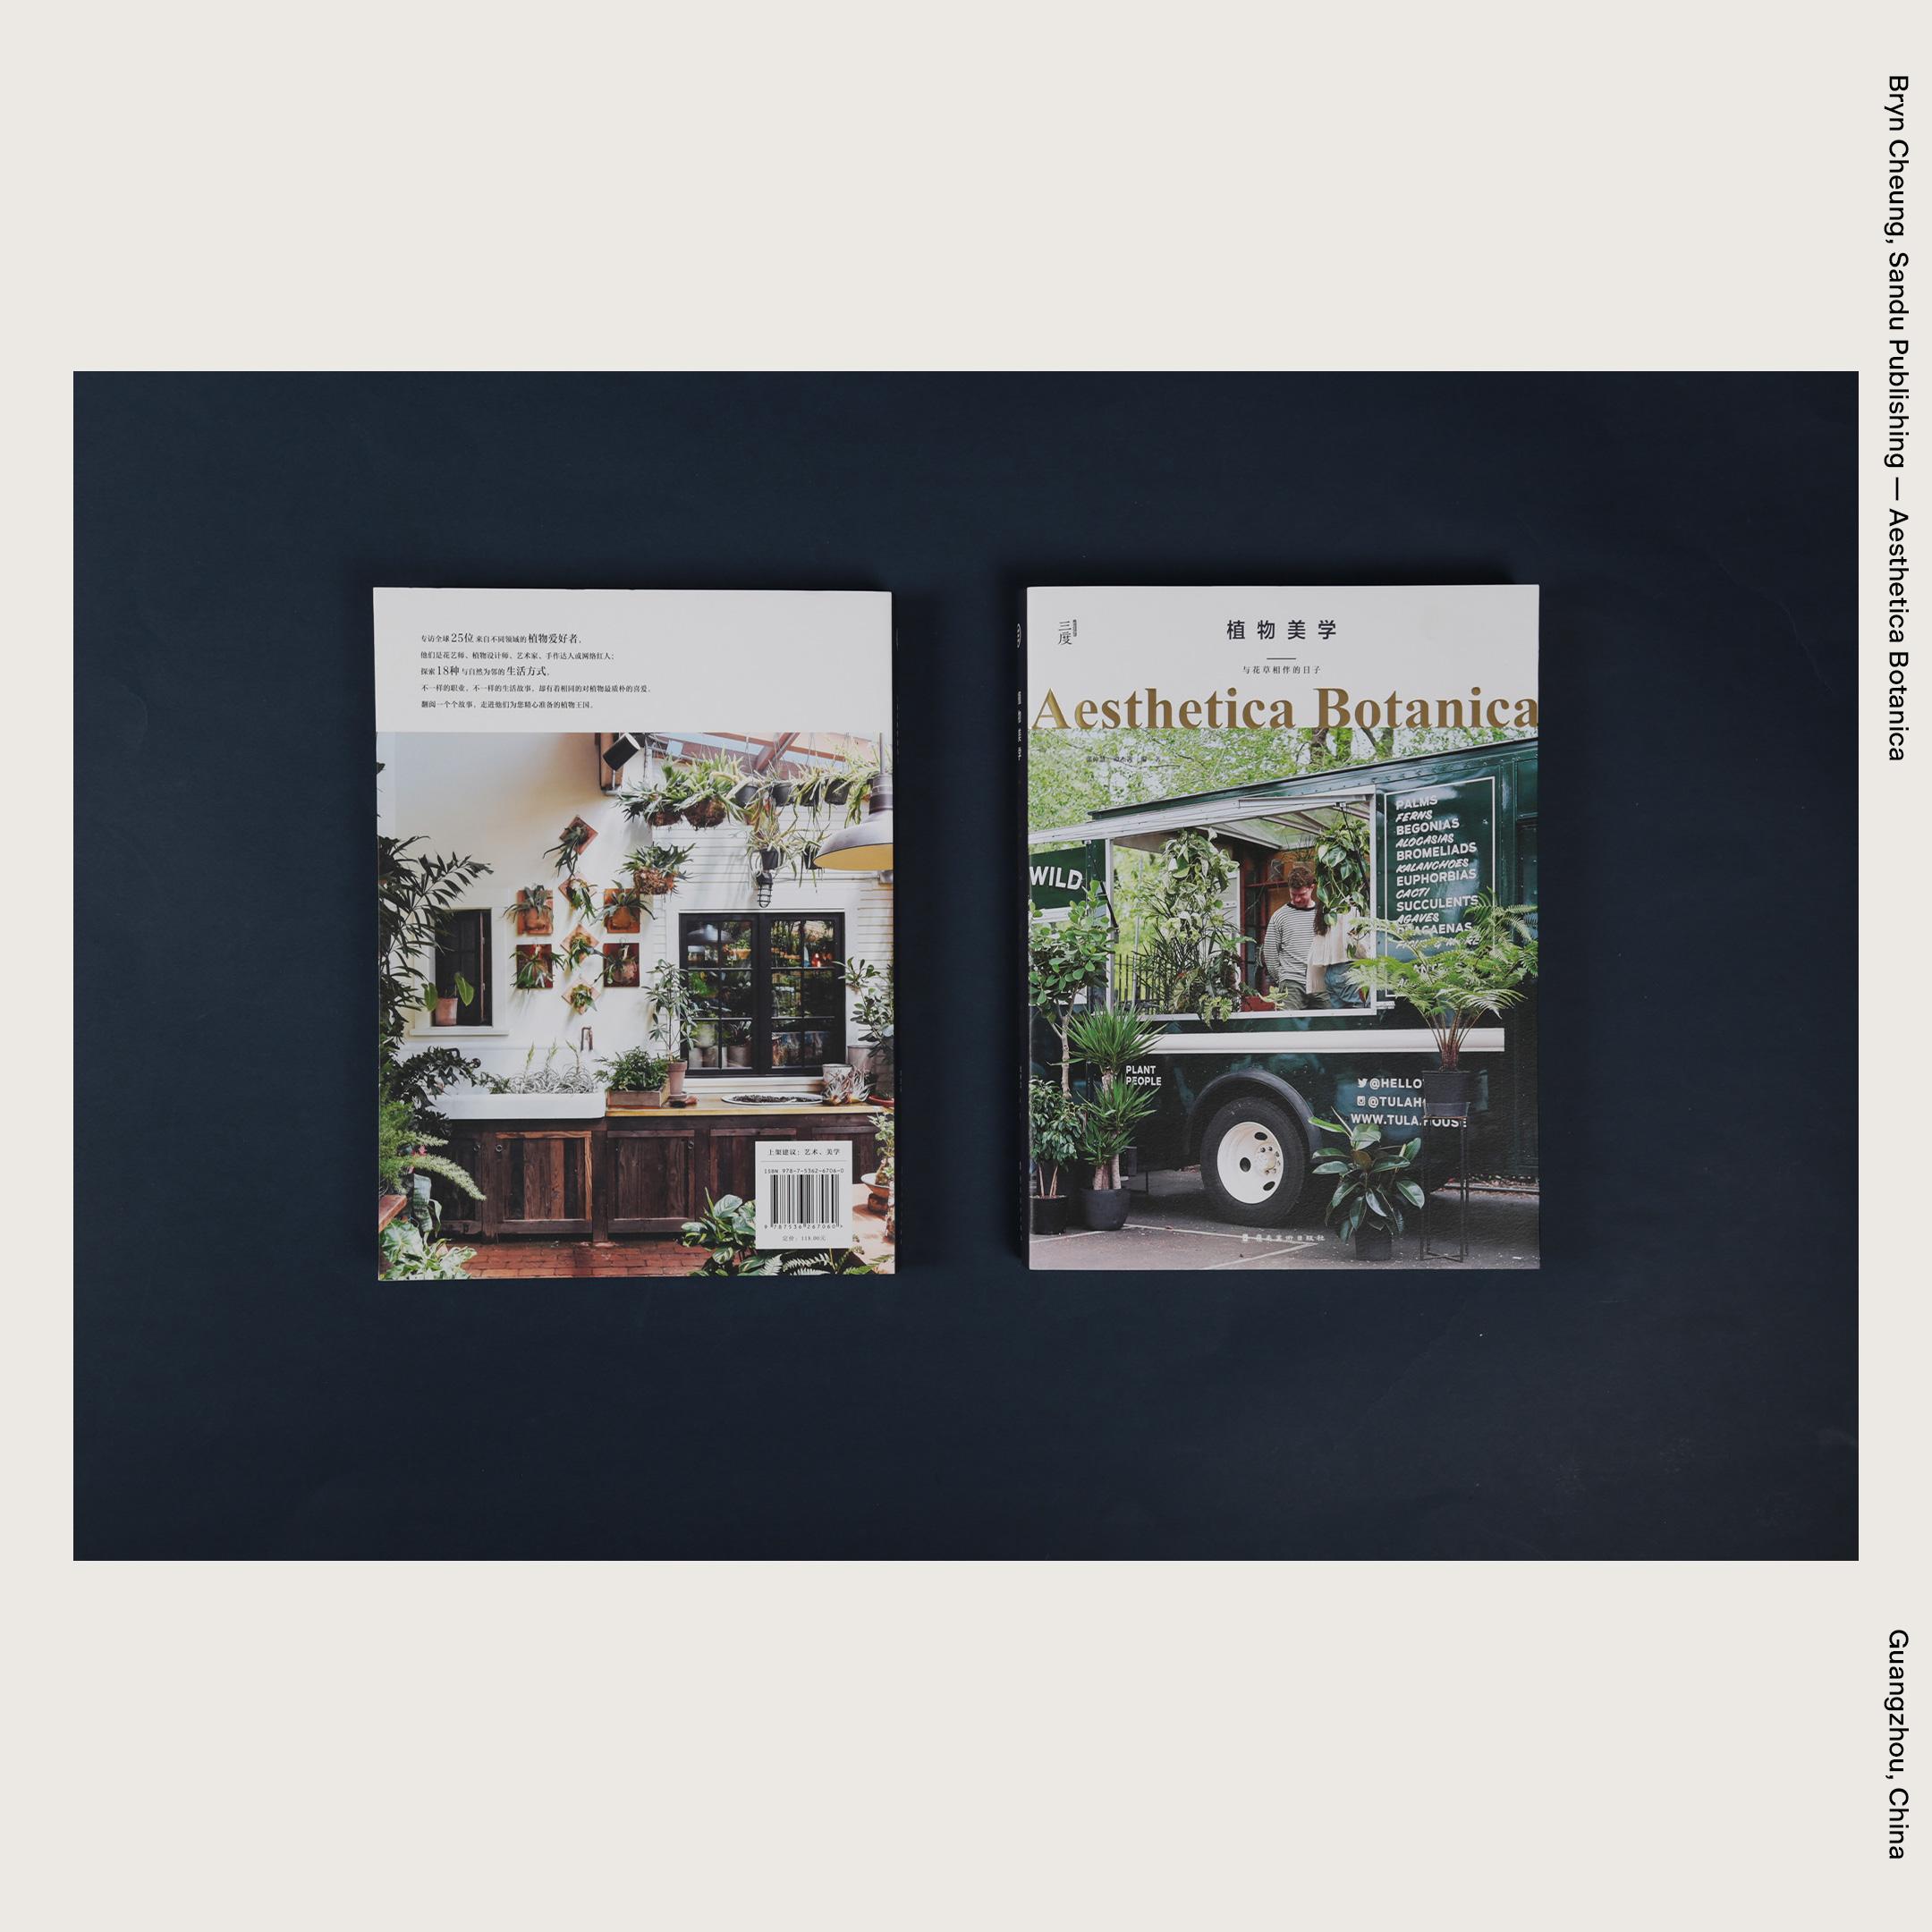 Bryn Cheung, Sandu Publishing — Aesthetica Botanica